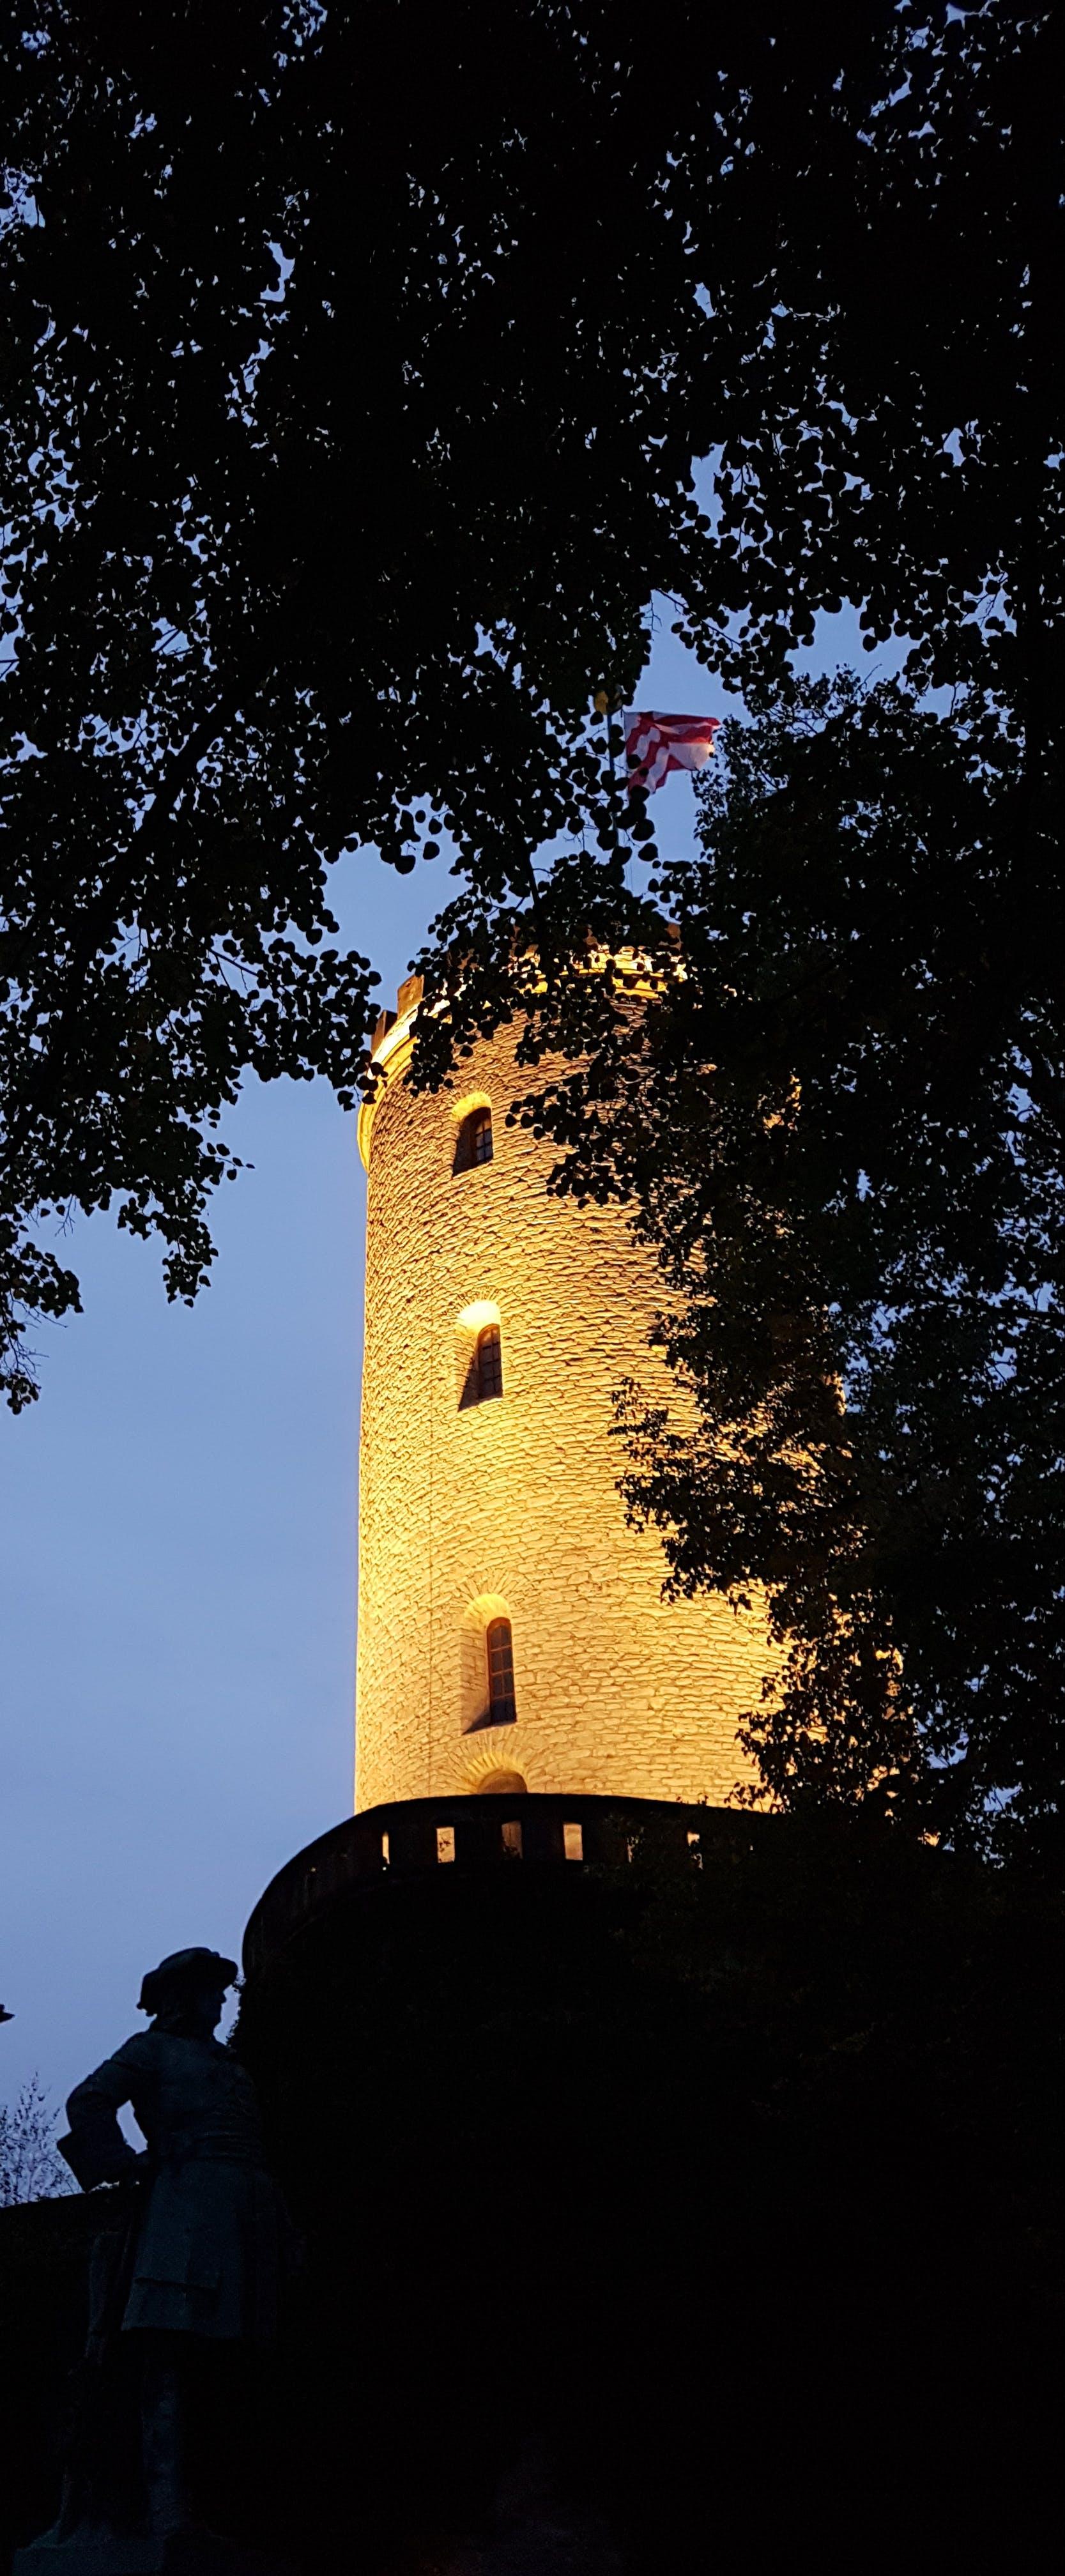 Free stock photo of atmospheric evening, Bielefeld, blue sky, castle